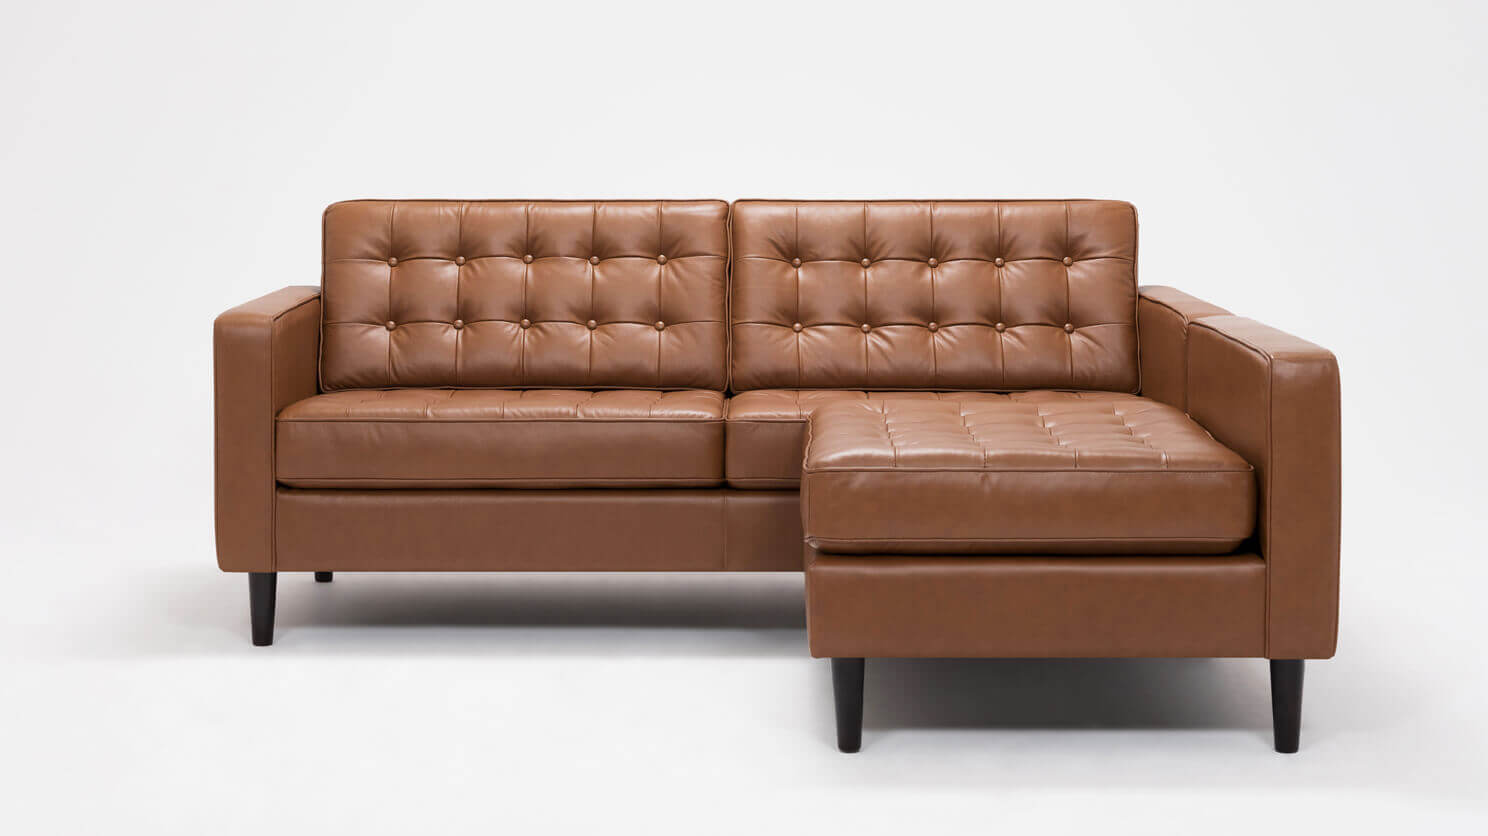 Reverie Apartment Sofa - Leather